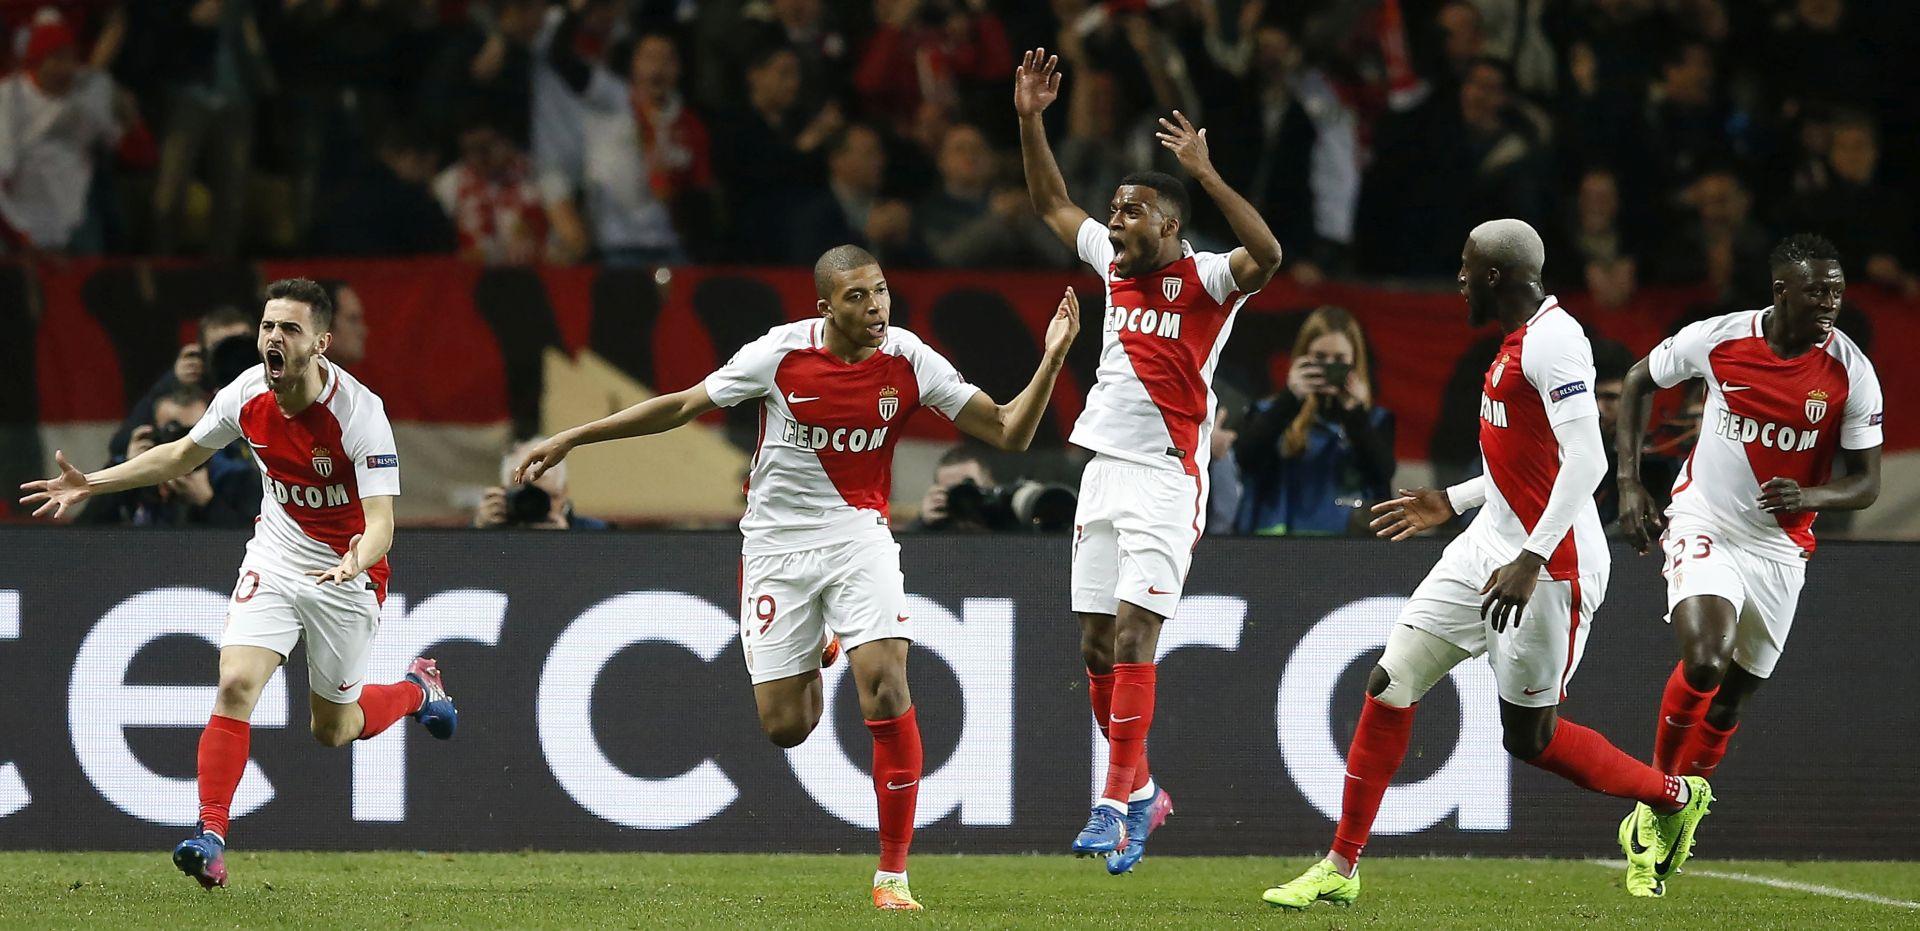 FRANCUSKI KUP Monaco i Guingamp izborili polufinale